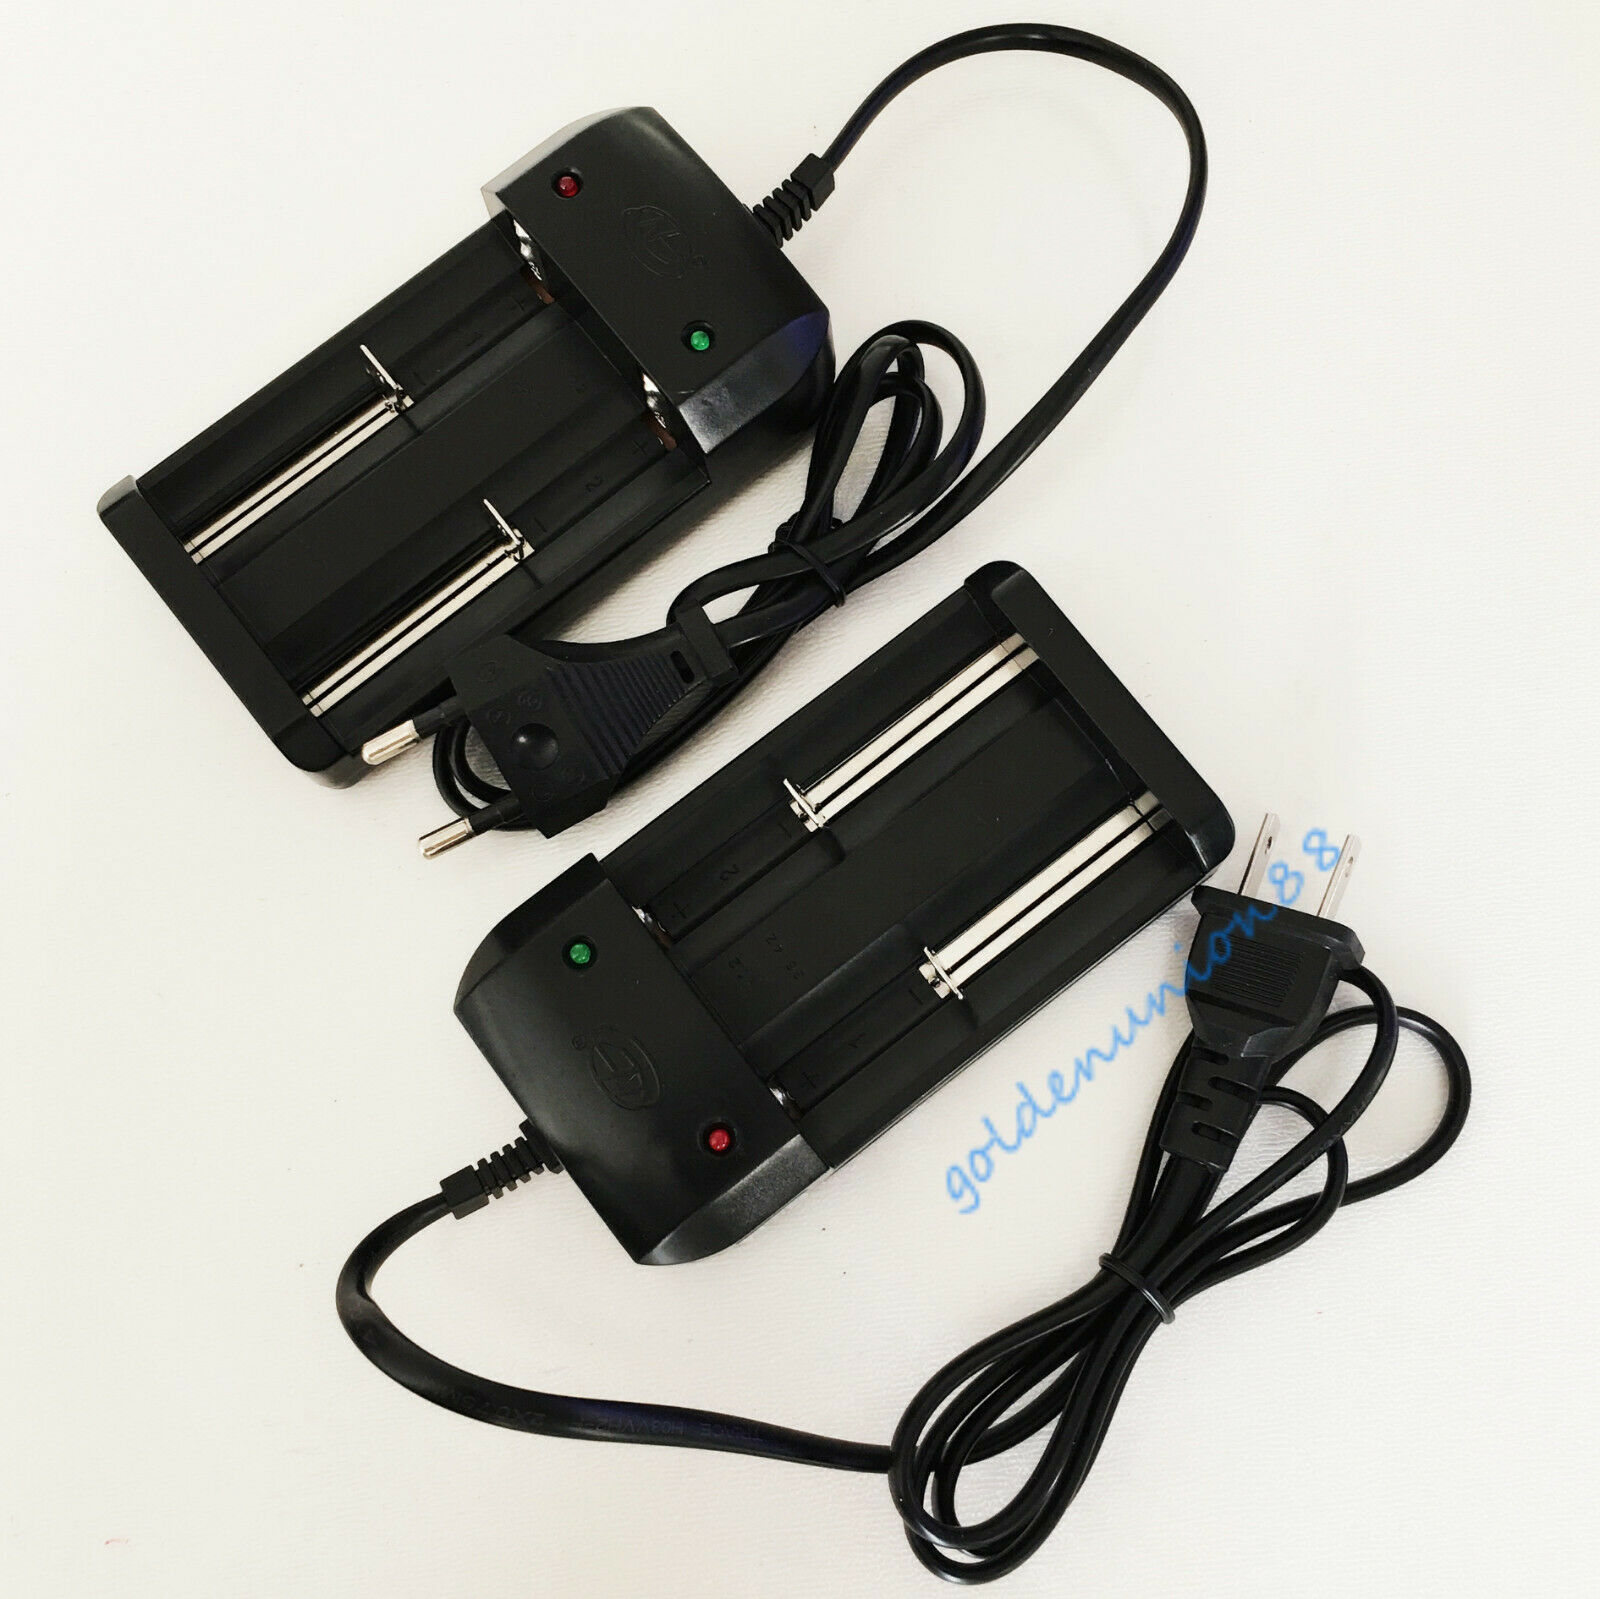 10PC 4.2V Charger for 3.7V 3.6V NMC LMO ICR 2X18650 26650 18500 Li-ion battery